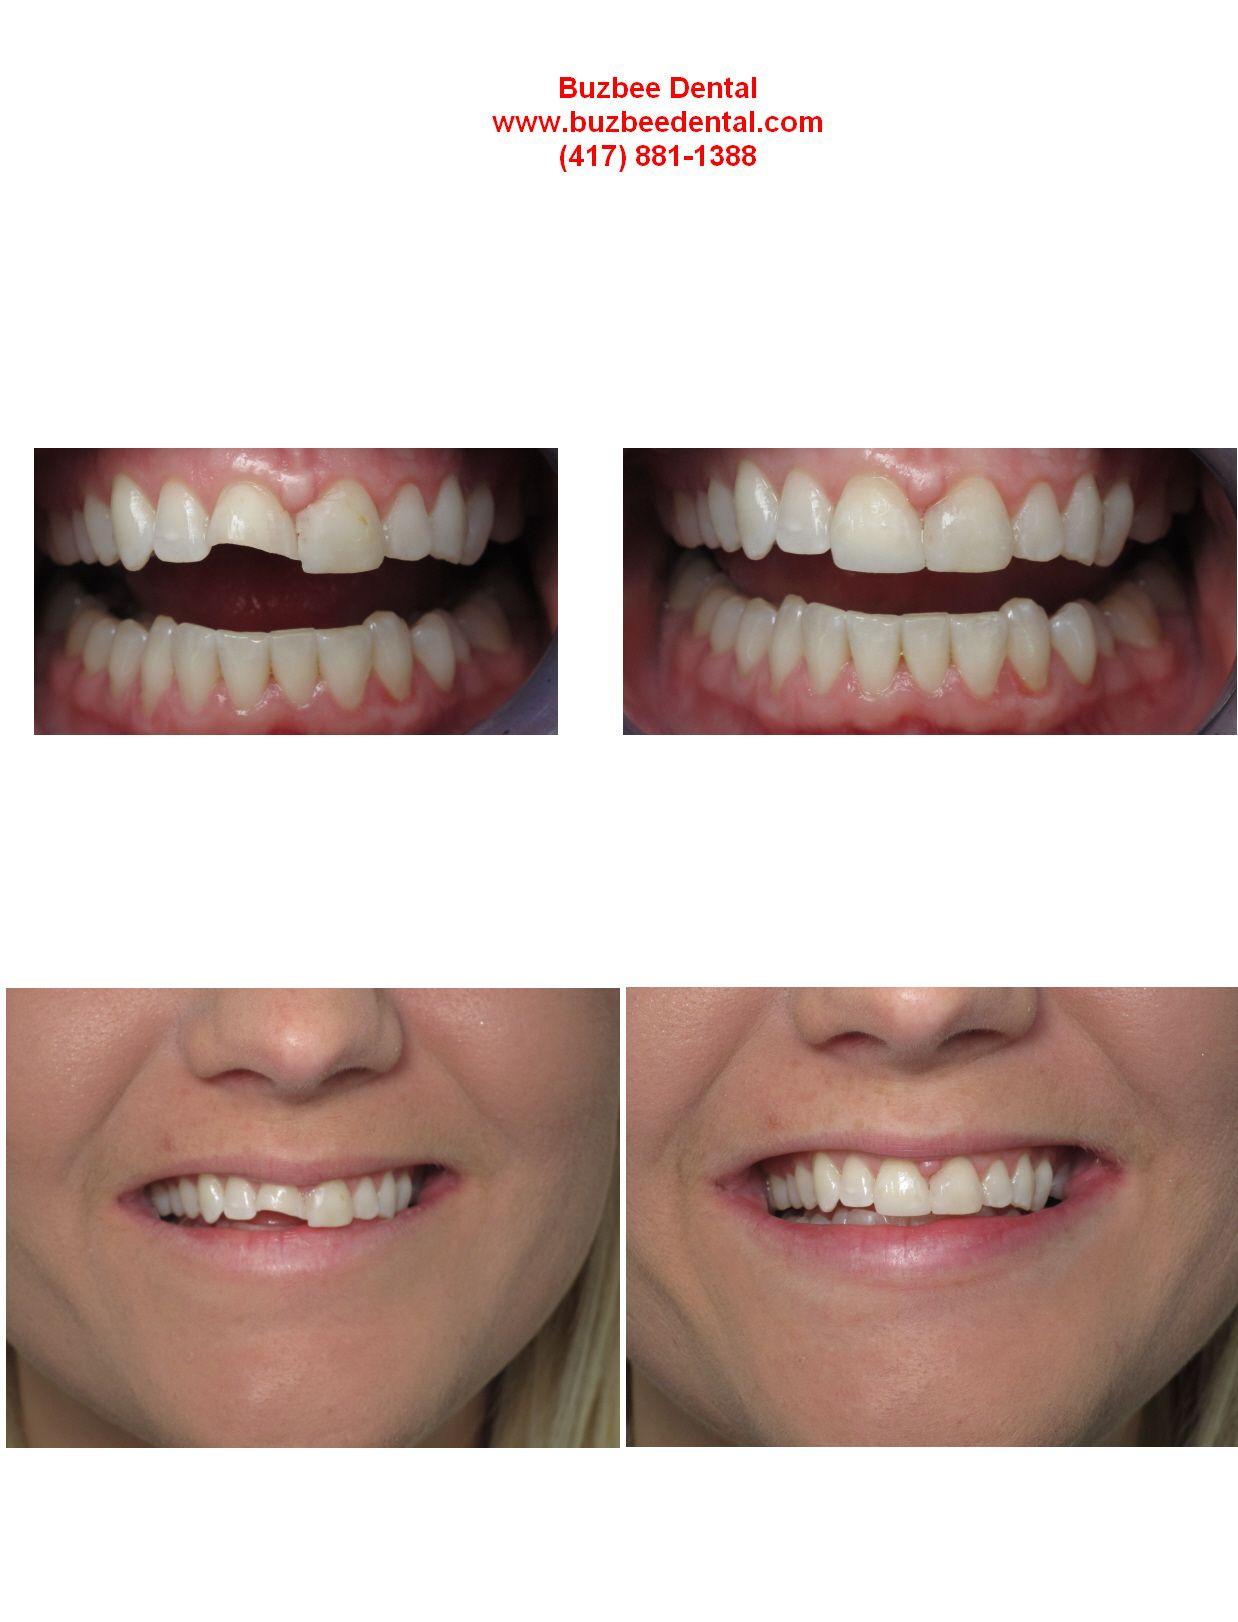 Unsuitable Oral Care Dental Implants Toothfairyiscomingtonight Dentalimplantsbeforeandaftersearching Dental Crowns Dental Dental Implants Cost